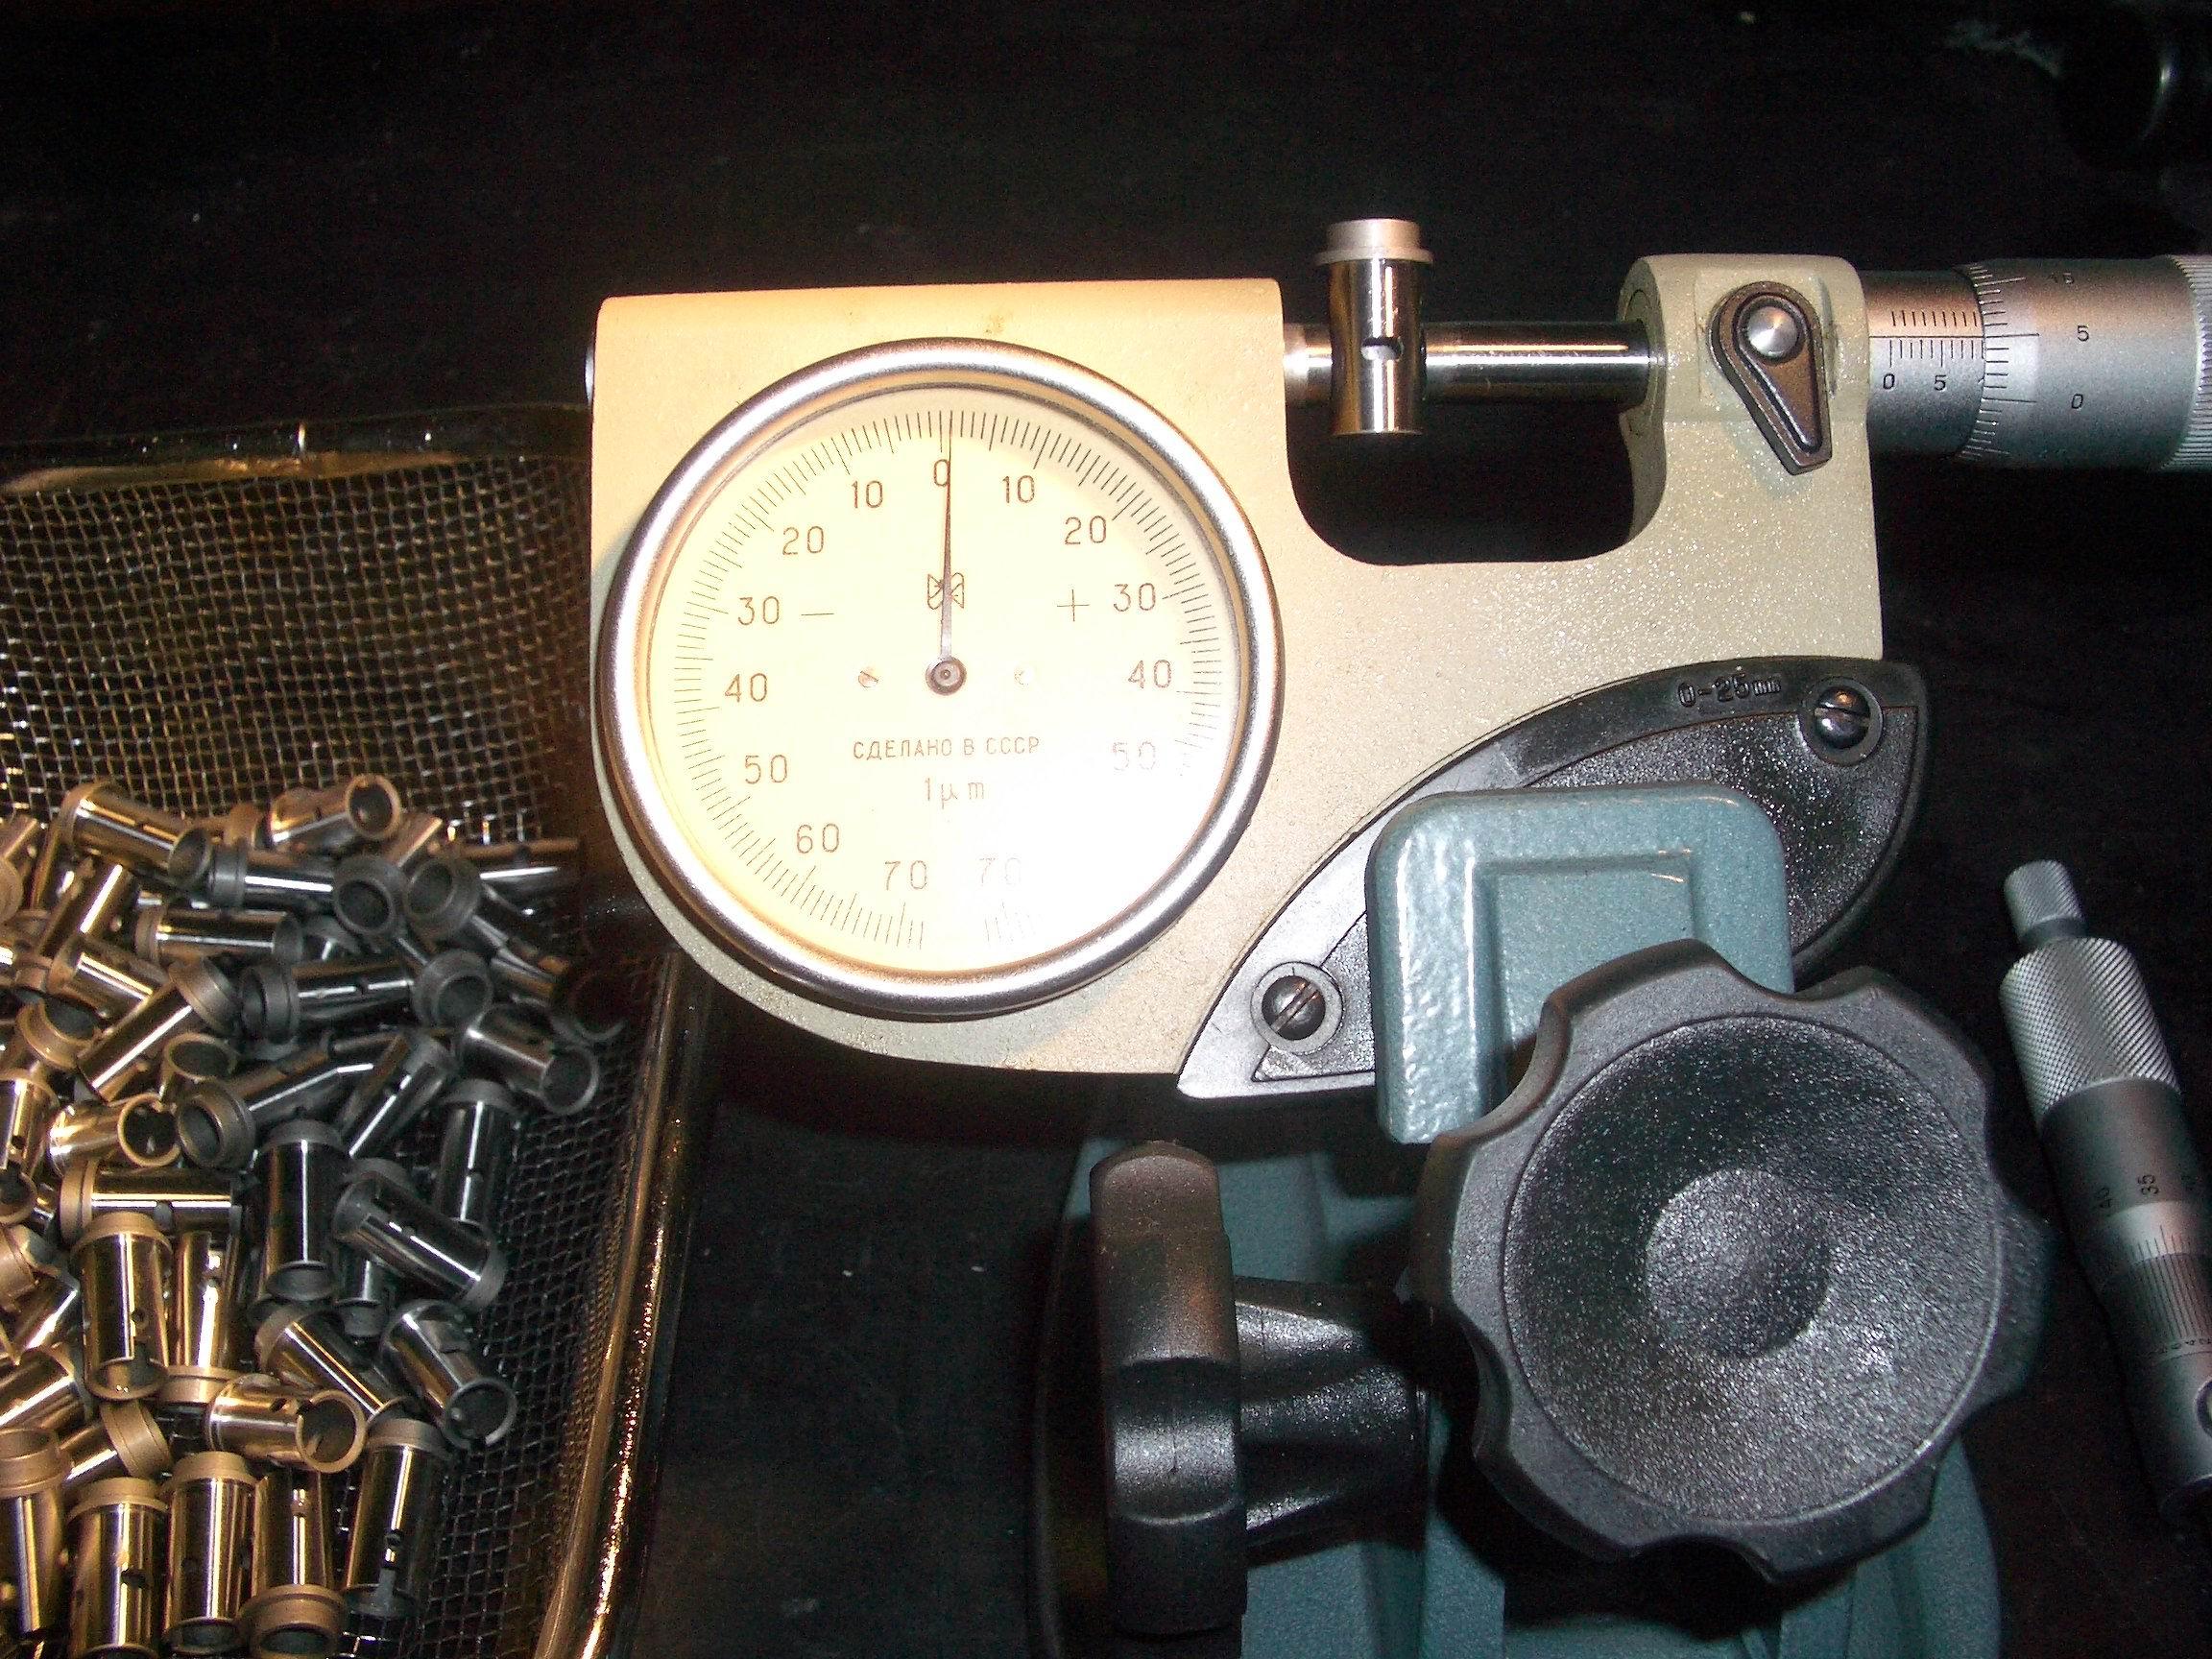 grind cyl od low res 001.jpg